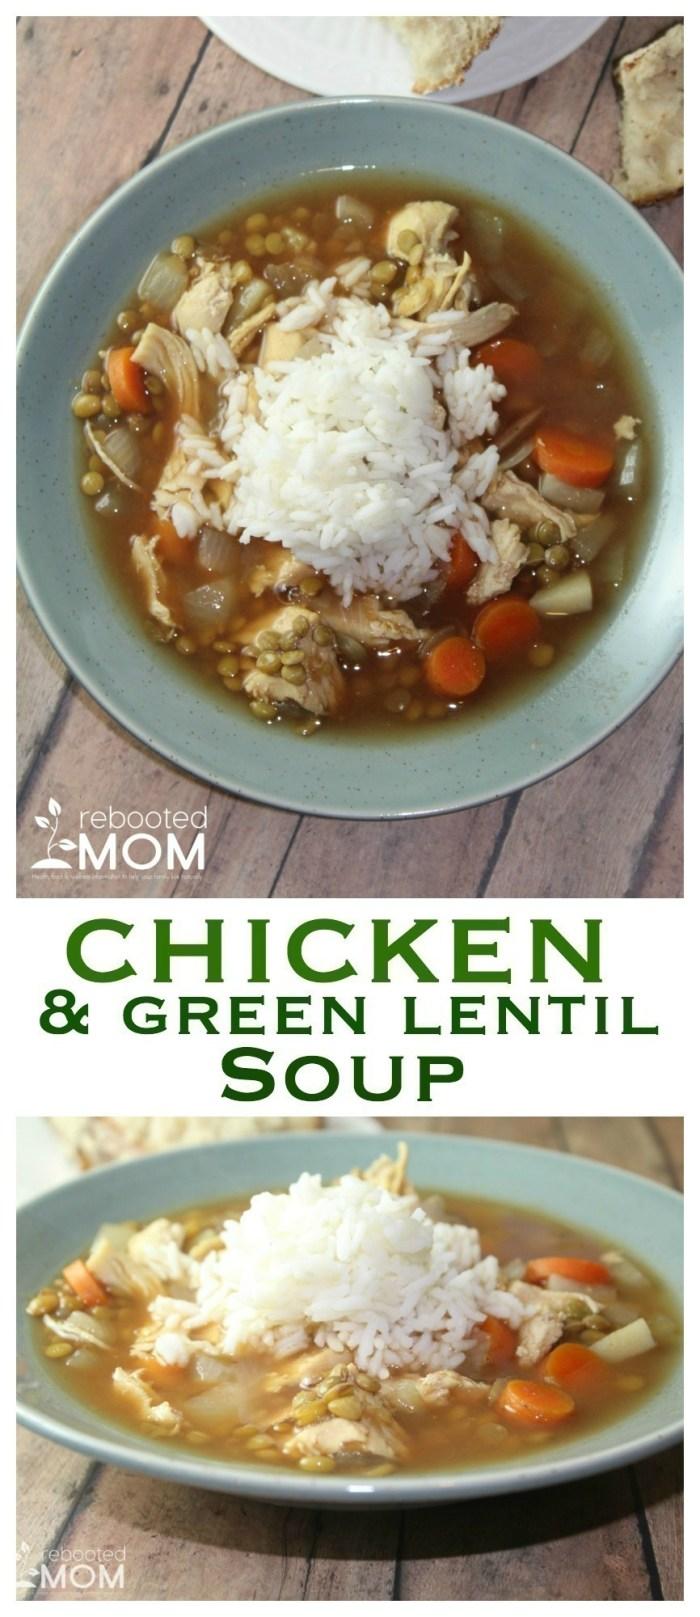 Chicken & Green Lentil Soup